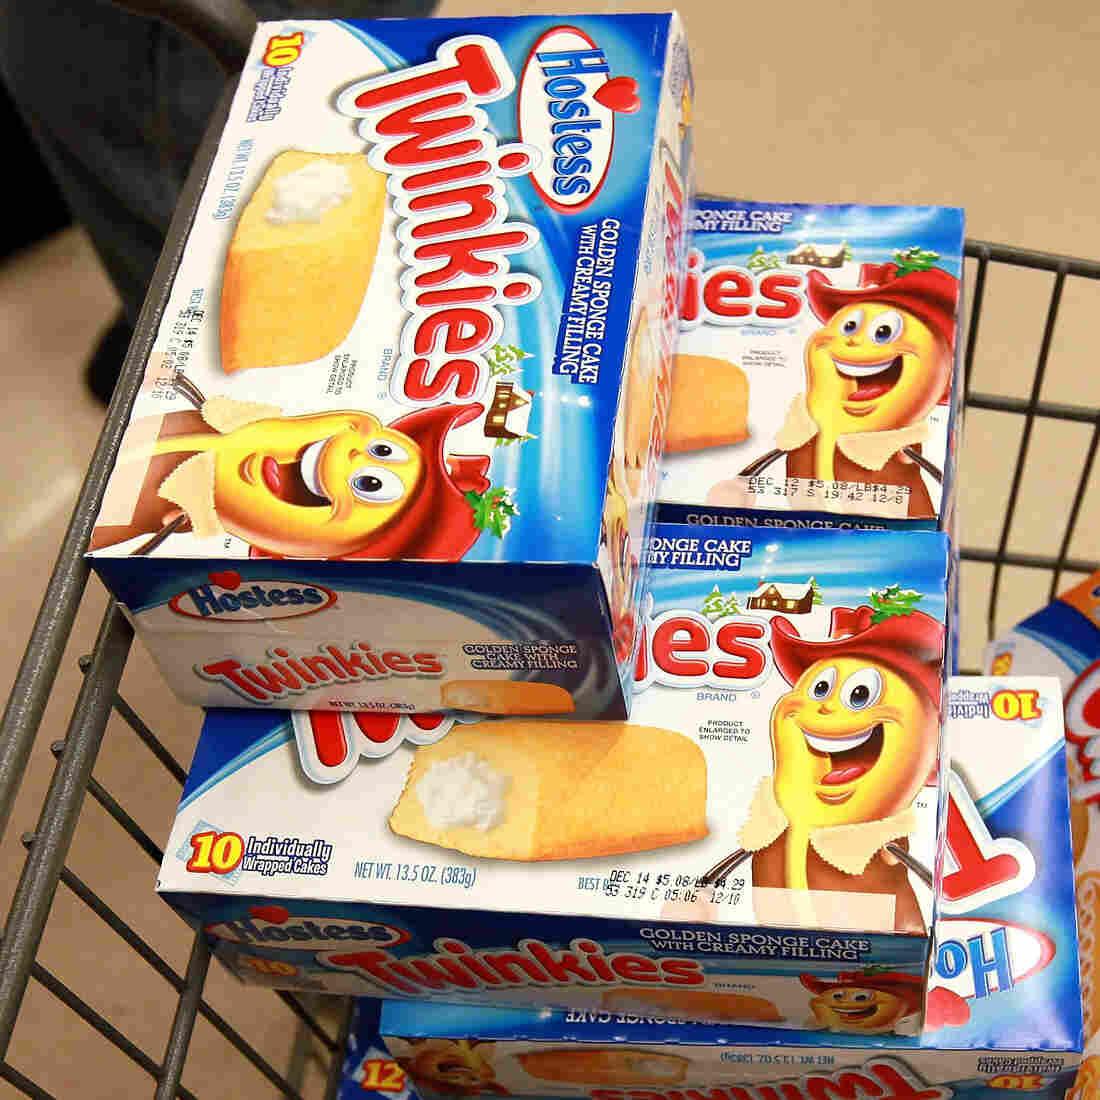 Nostalgia Products: Making A Tasty Comeback